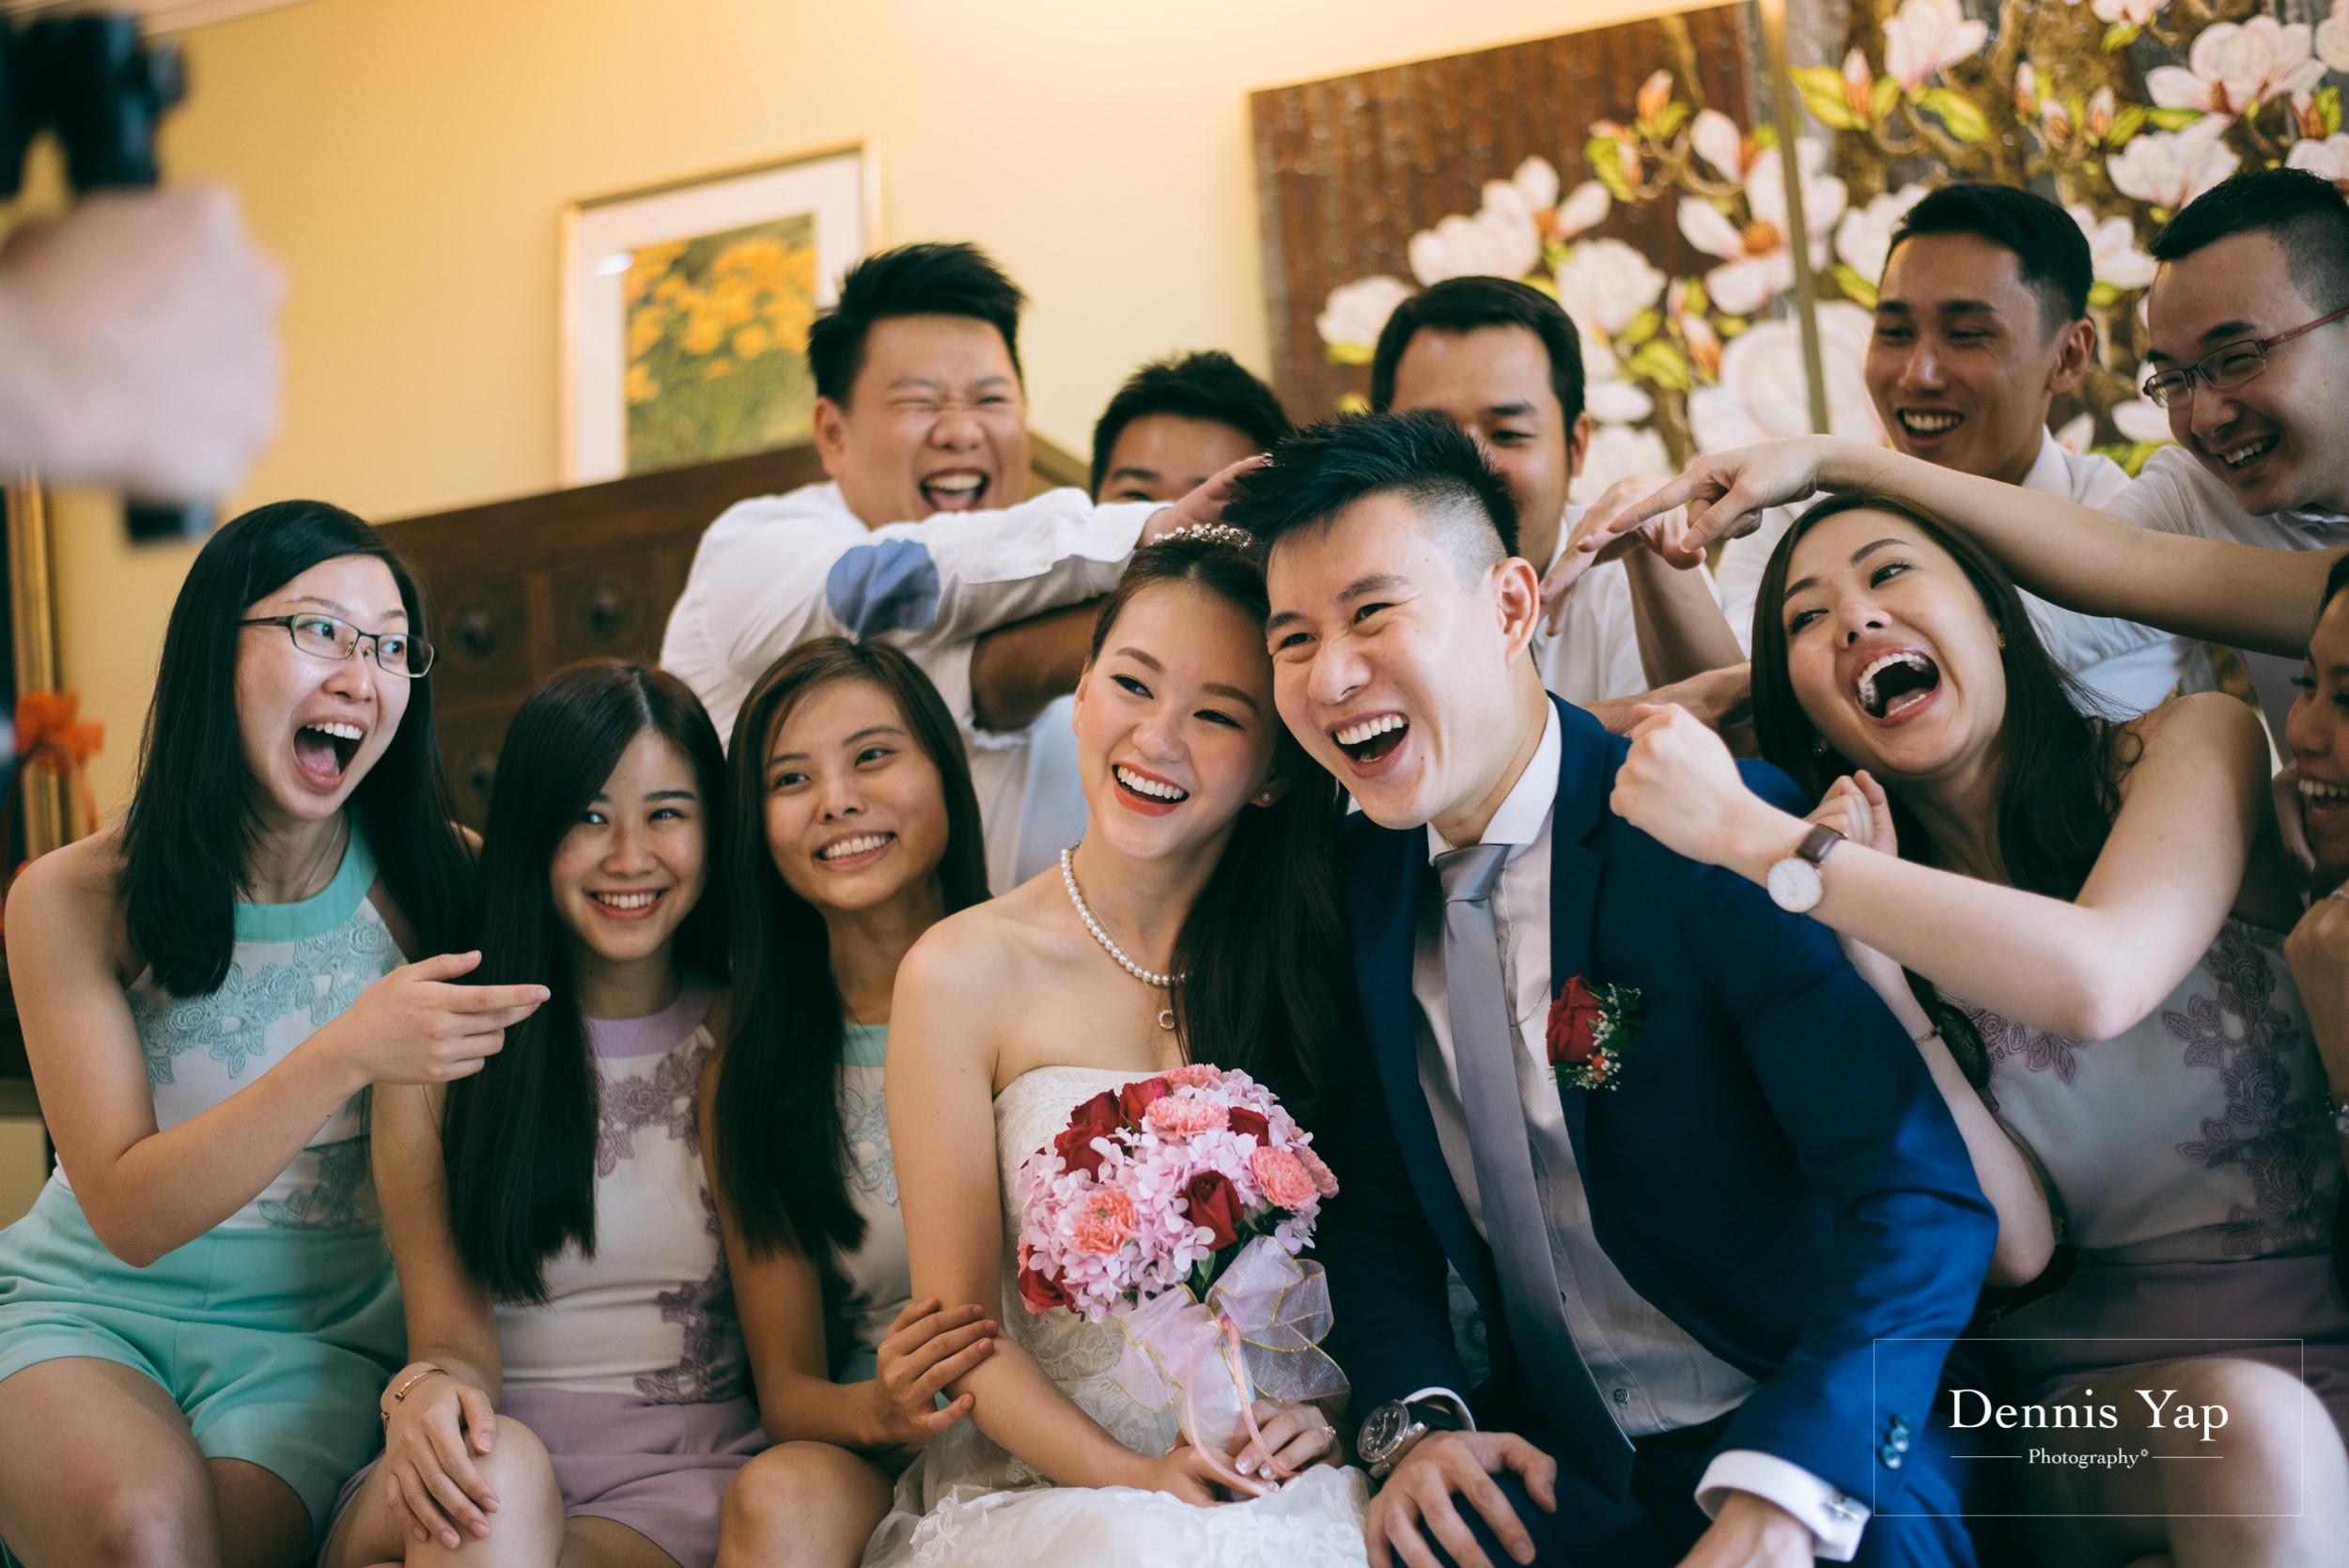 ethan juli wedding day gate crash wedding party dennis yap photography colors-44.jpg